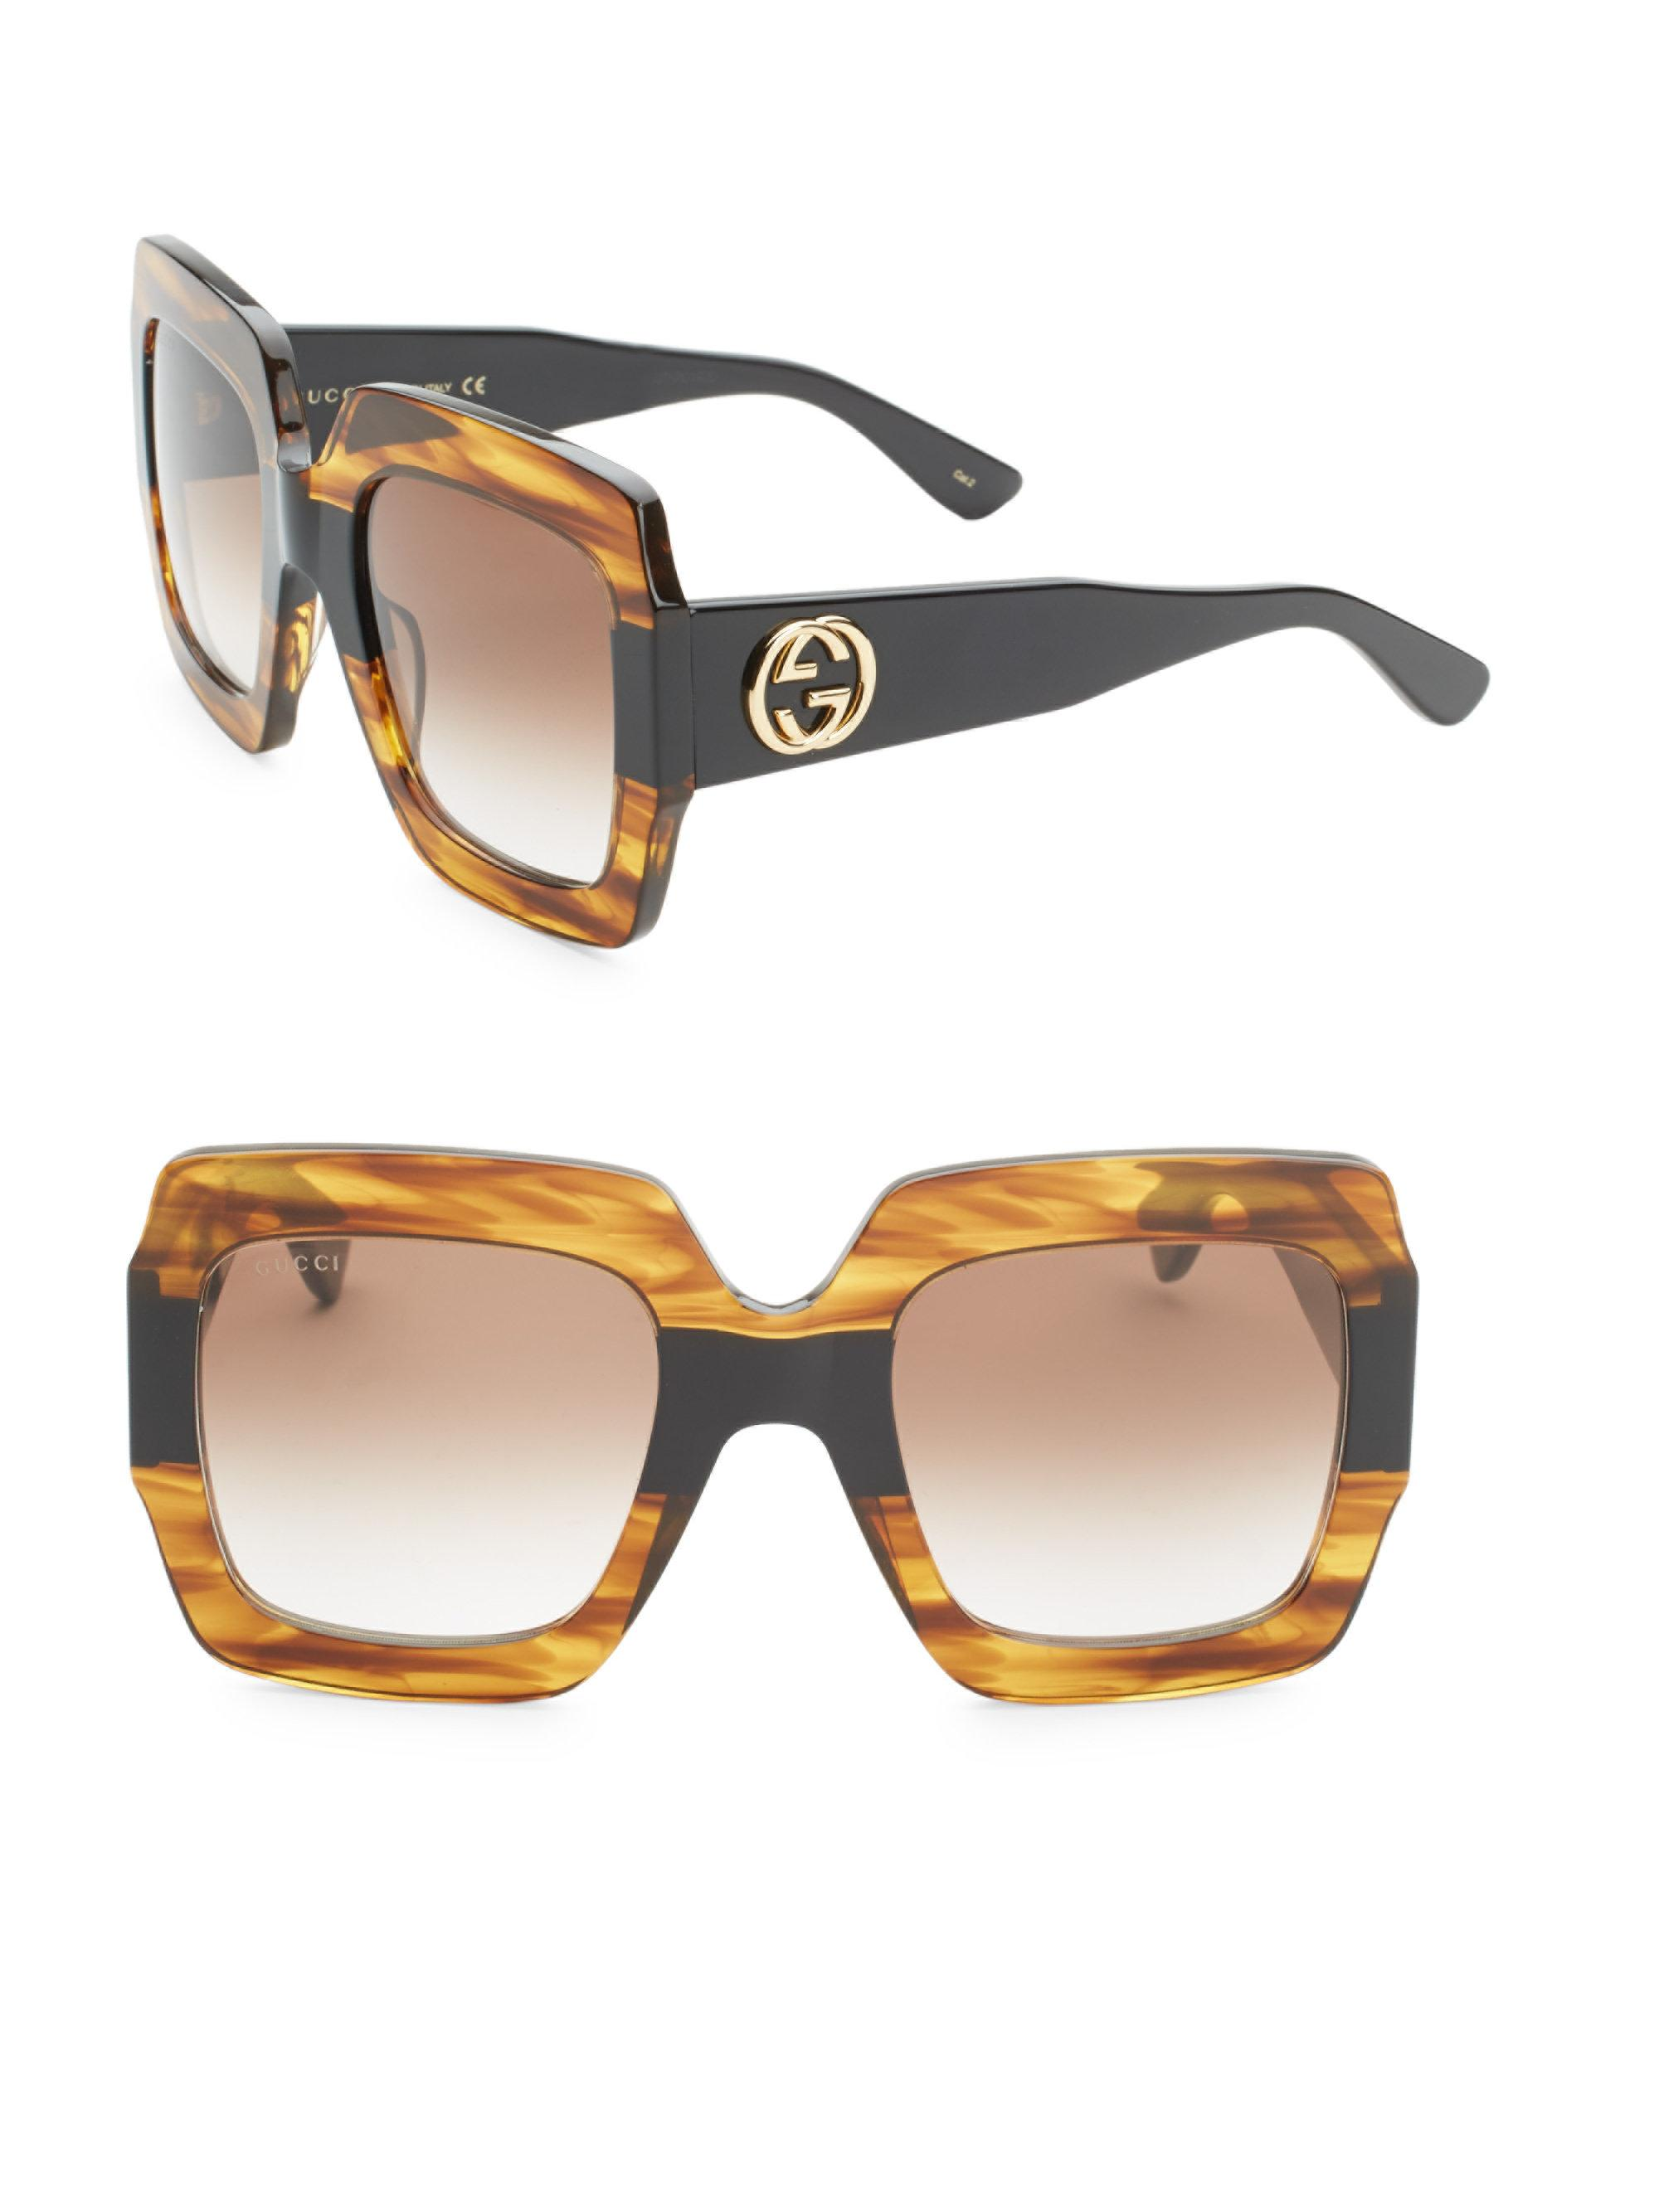 03979c7bc4cd5 Gucci - Multicolor 54mm Square Sunglasses - Shny Multlay Gloss Rose brn -  Lyst. View fullscreen